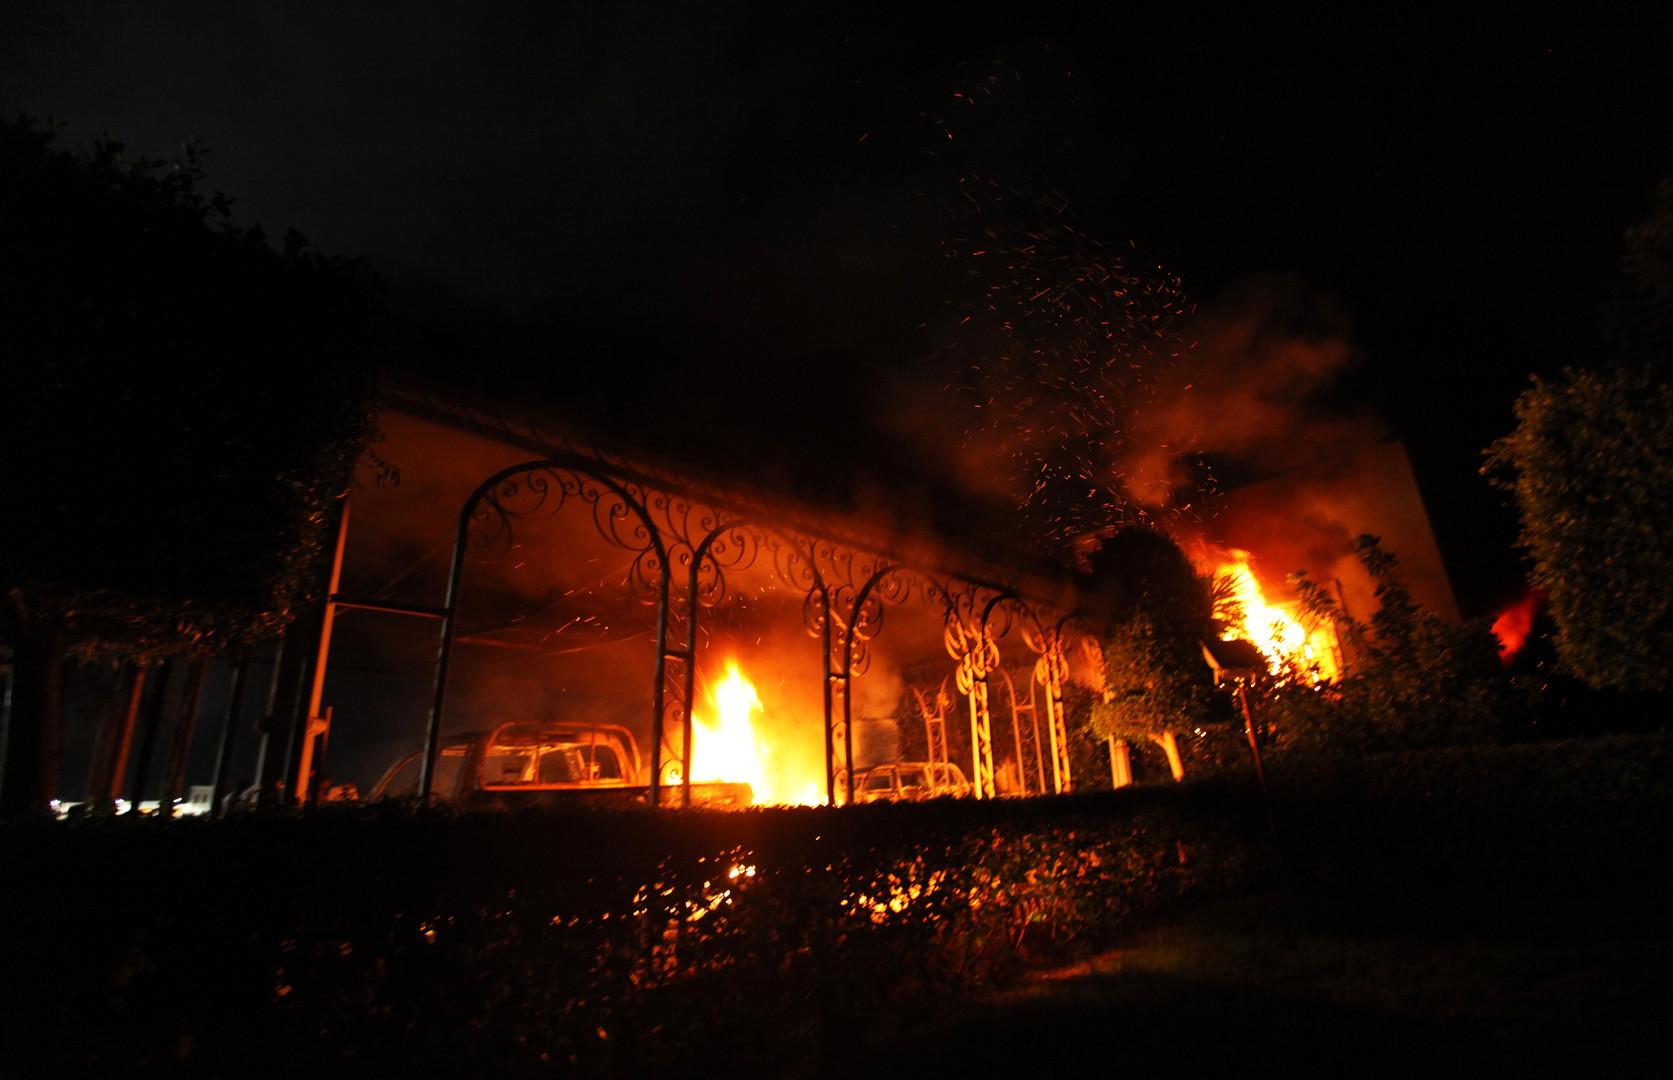 Le consulat américain de Benghazi en feu, après les attaques du 11 septembre 2012.